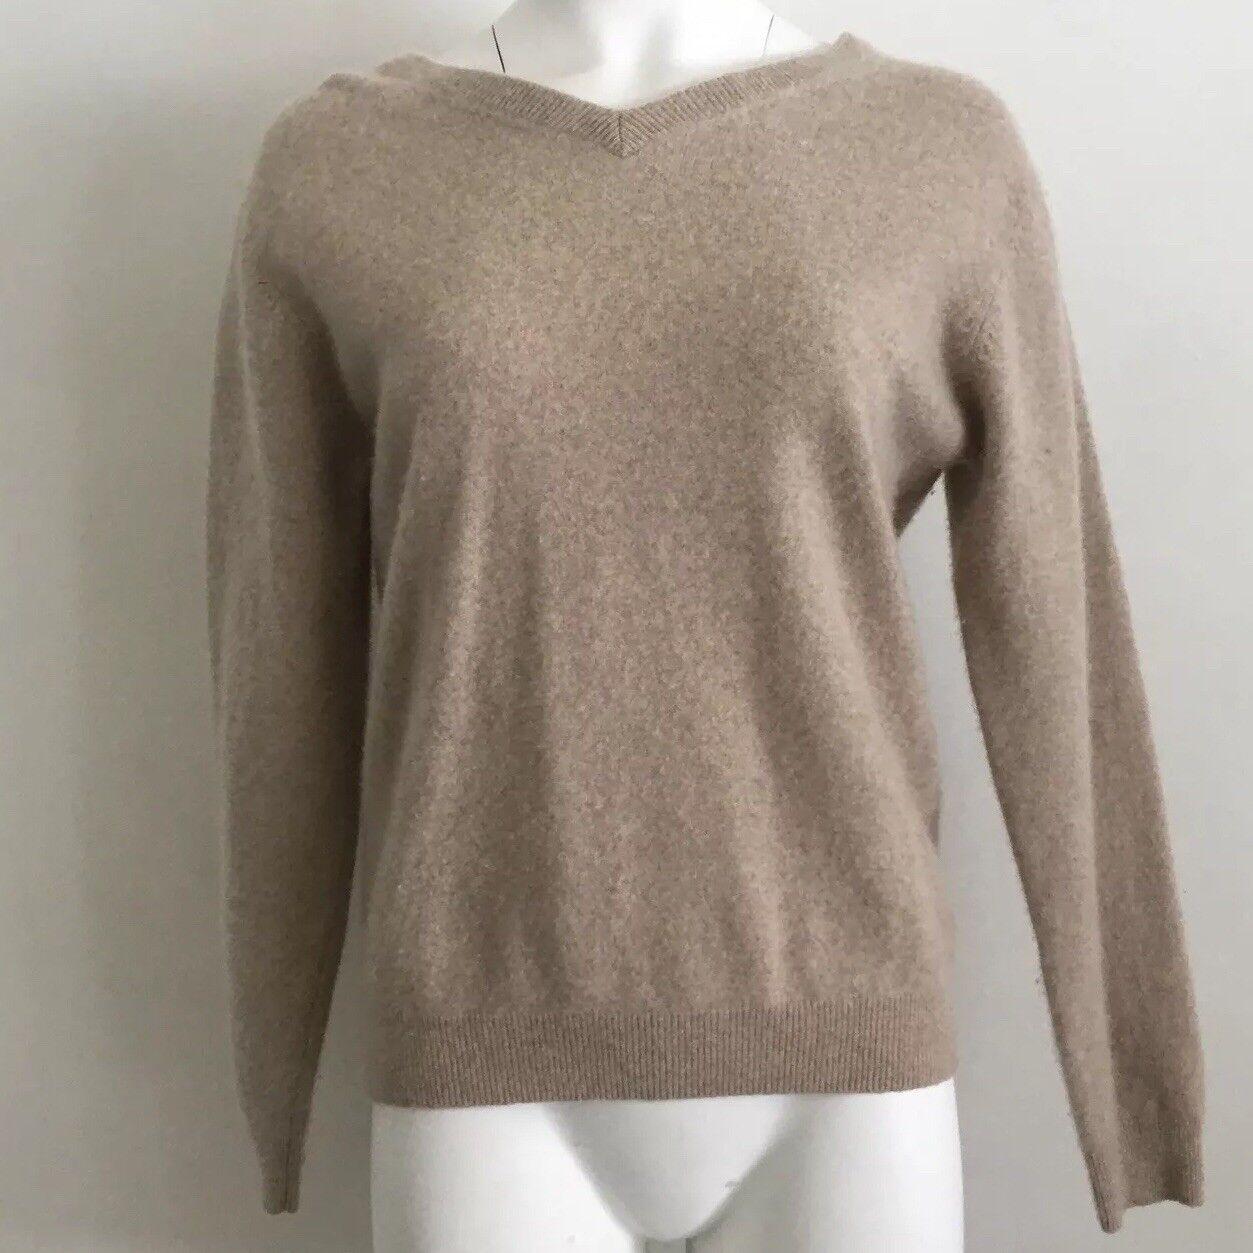 Pronto men Womens Sweater M M M Medium 100% Cashmere Beige Brown Minimalist 3f3883